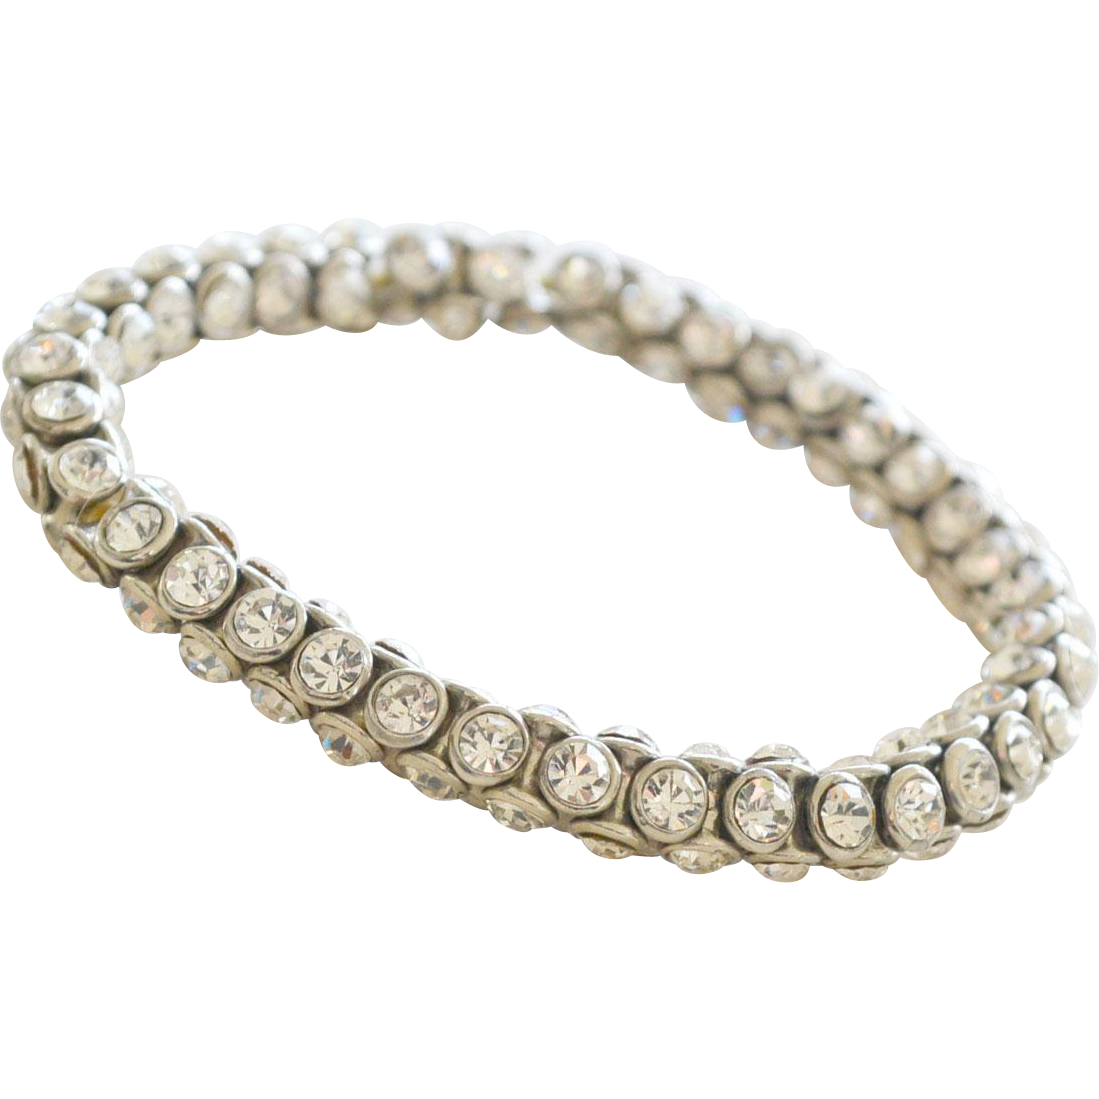 Bracelet All Round Rhinestones